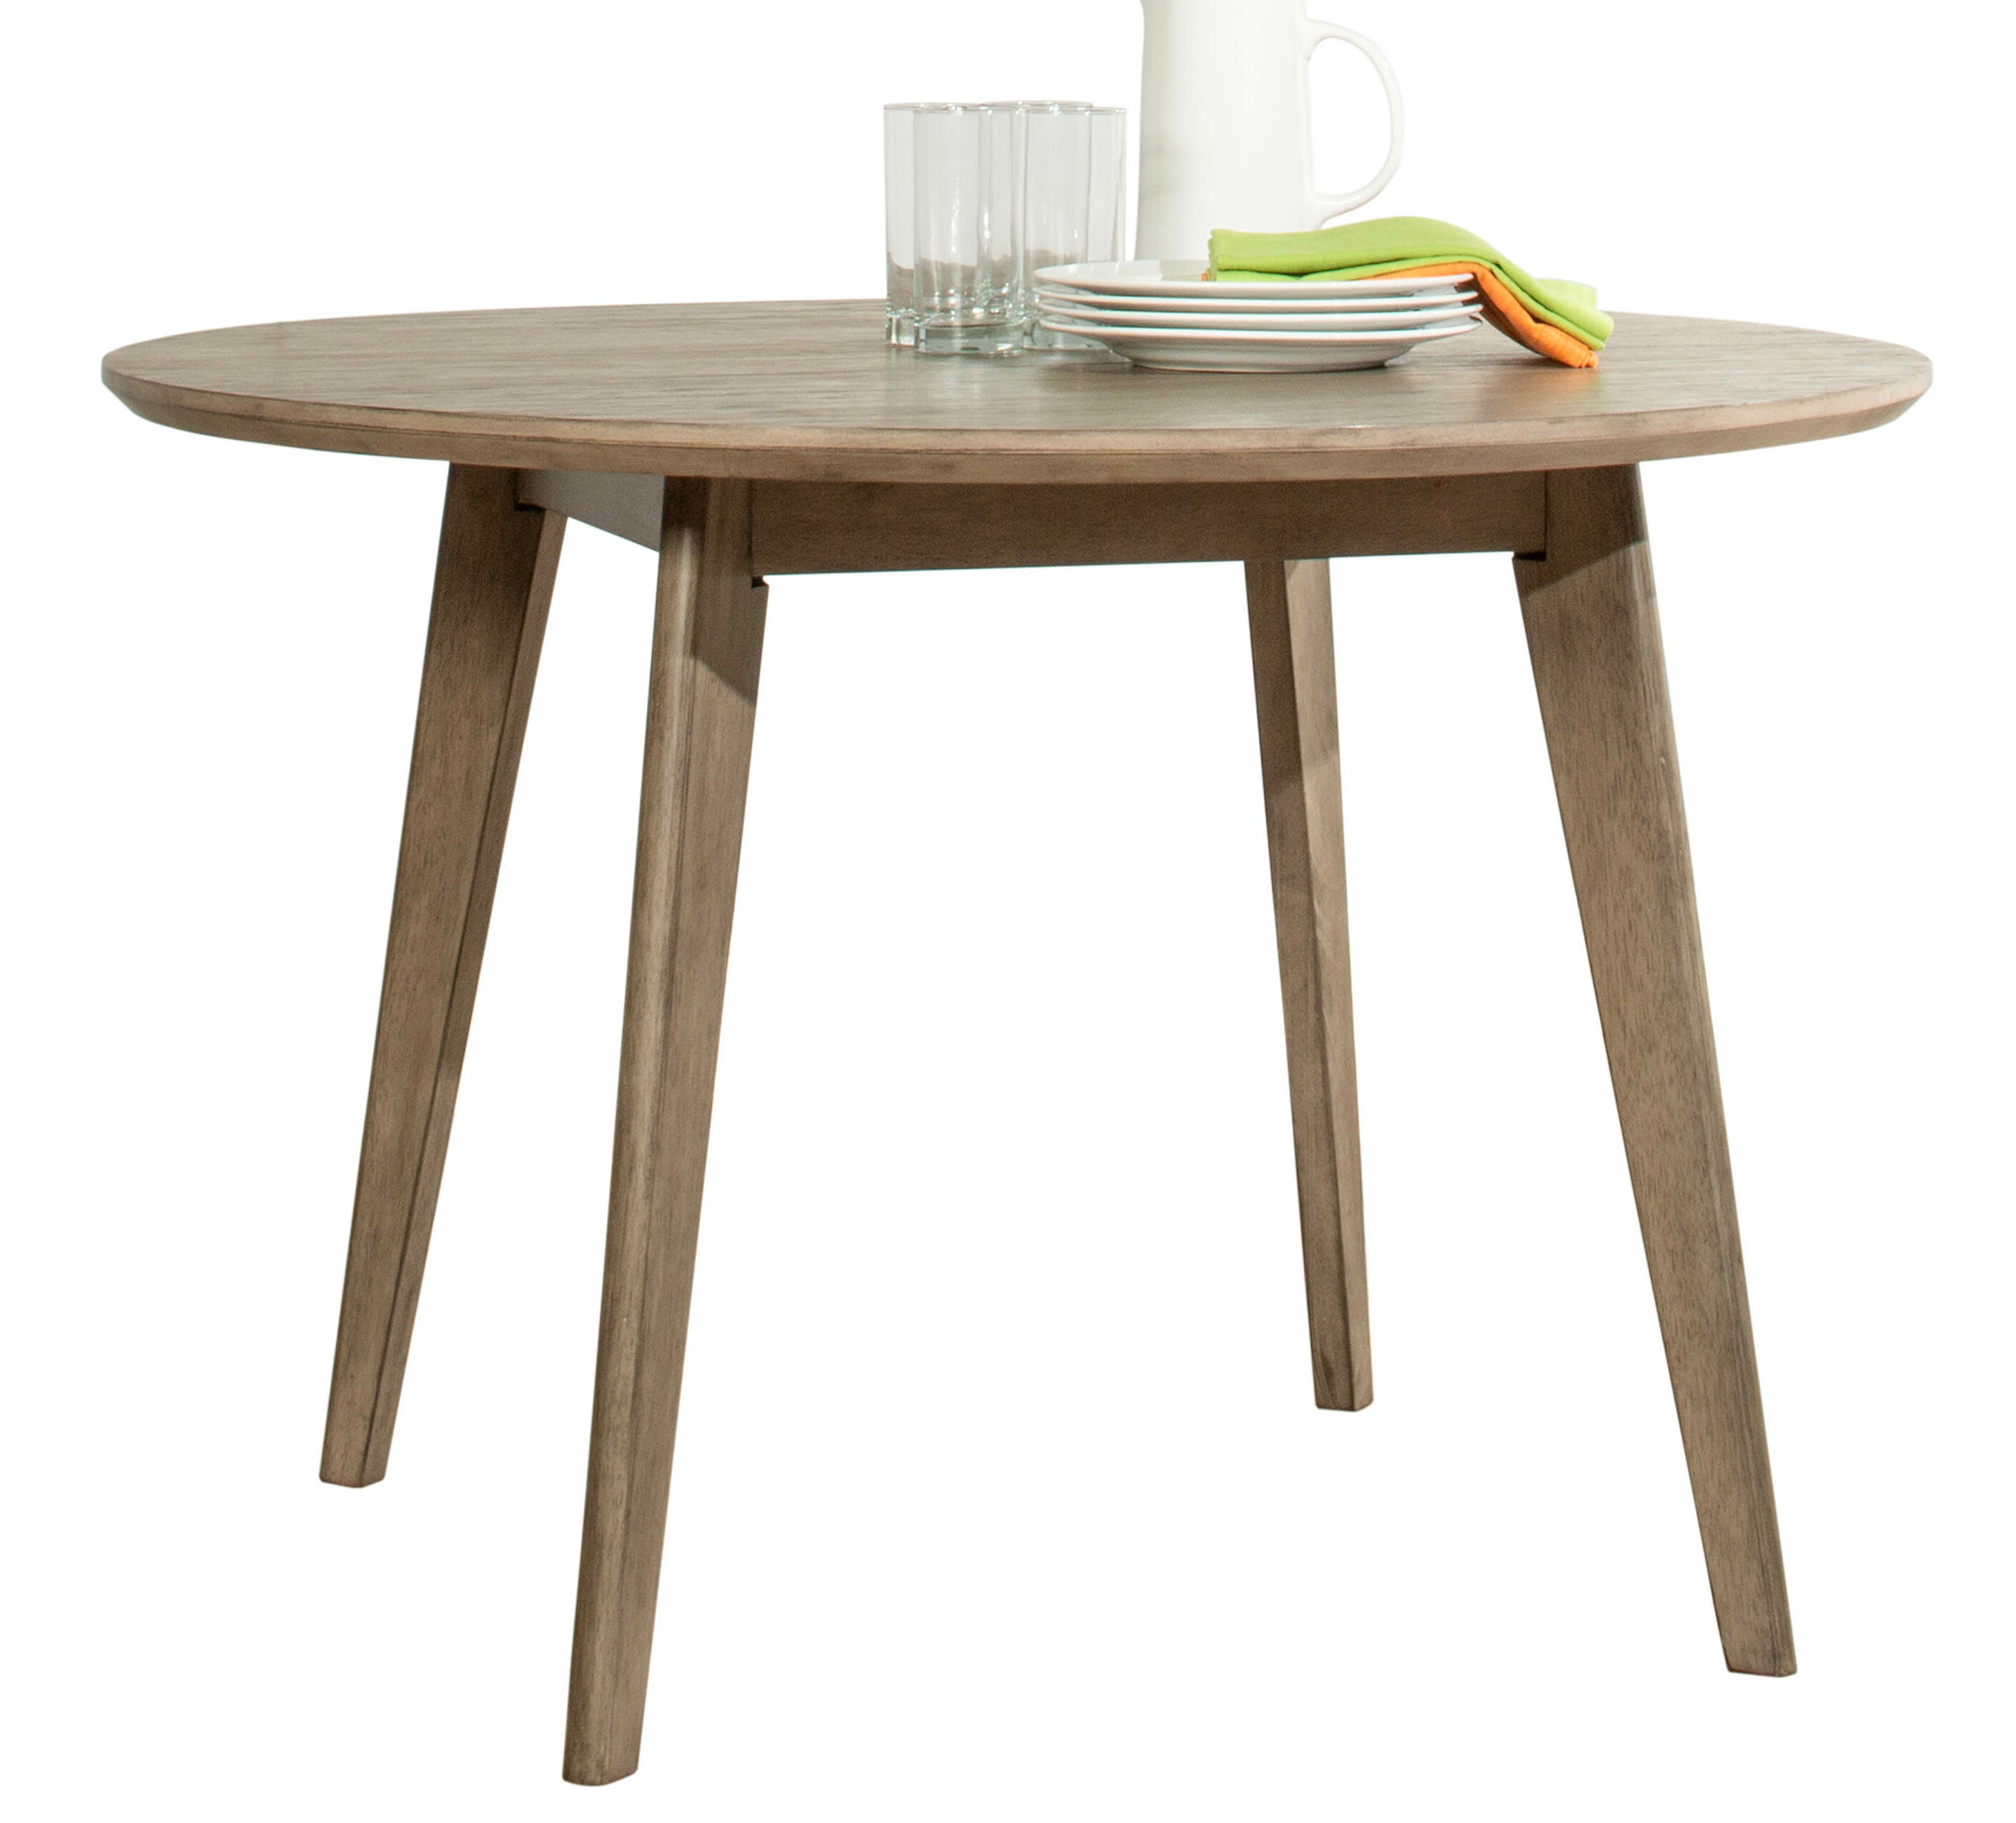 Gracie Oaks Modern Round Wood Dining Table Weathered Grey Reviews Wayfair Ca